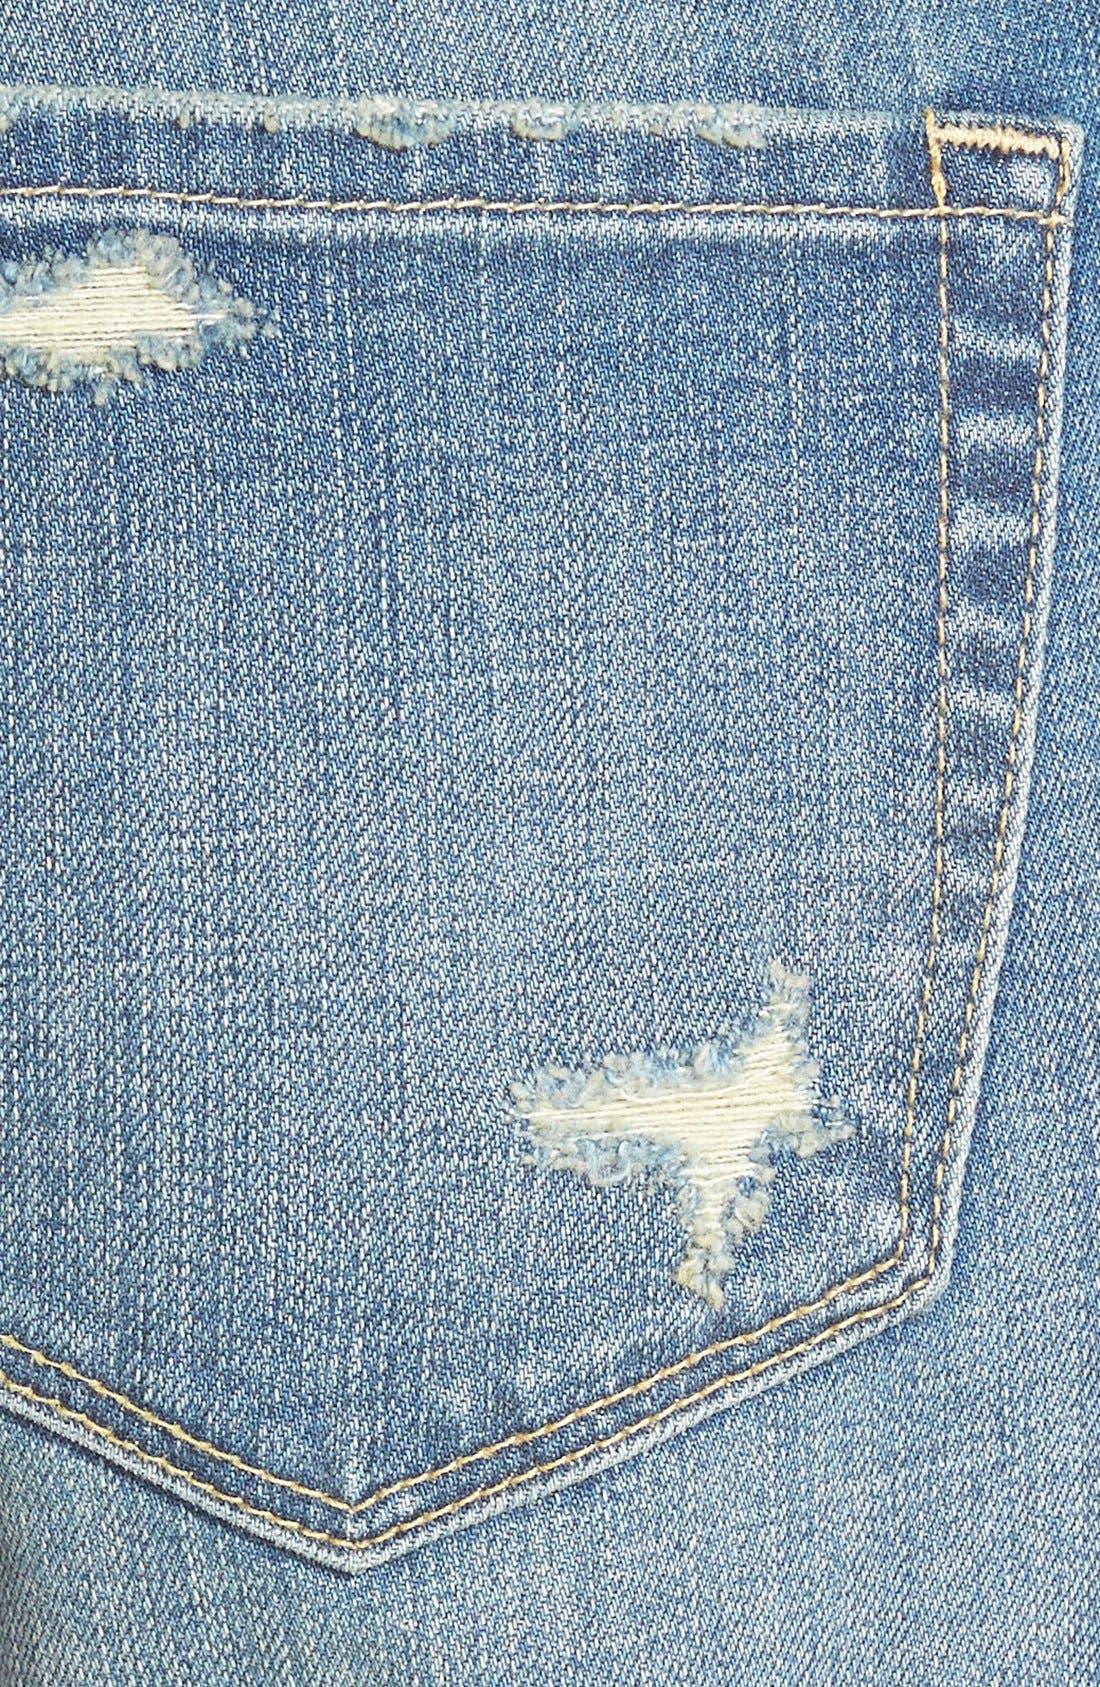 Alternate Image 4  - Treasure&Bond Boyfriend Jeans (Cross Light Tint)